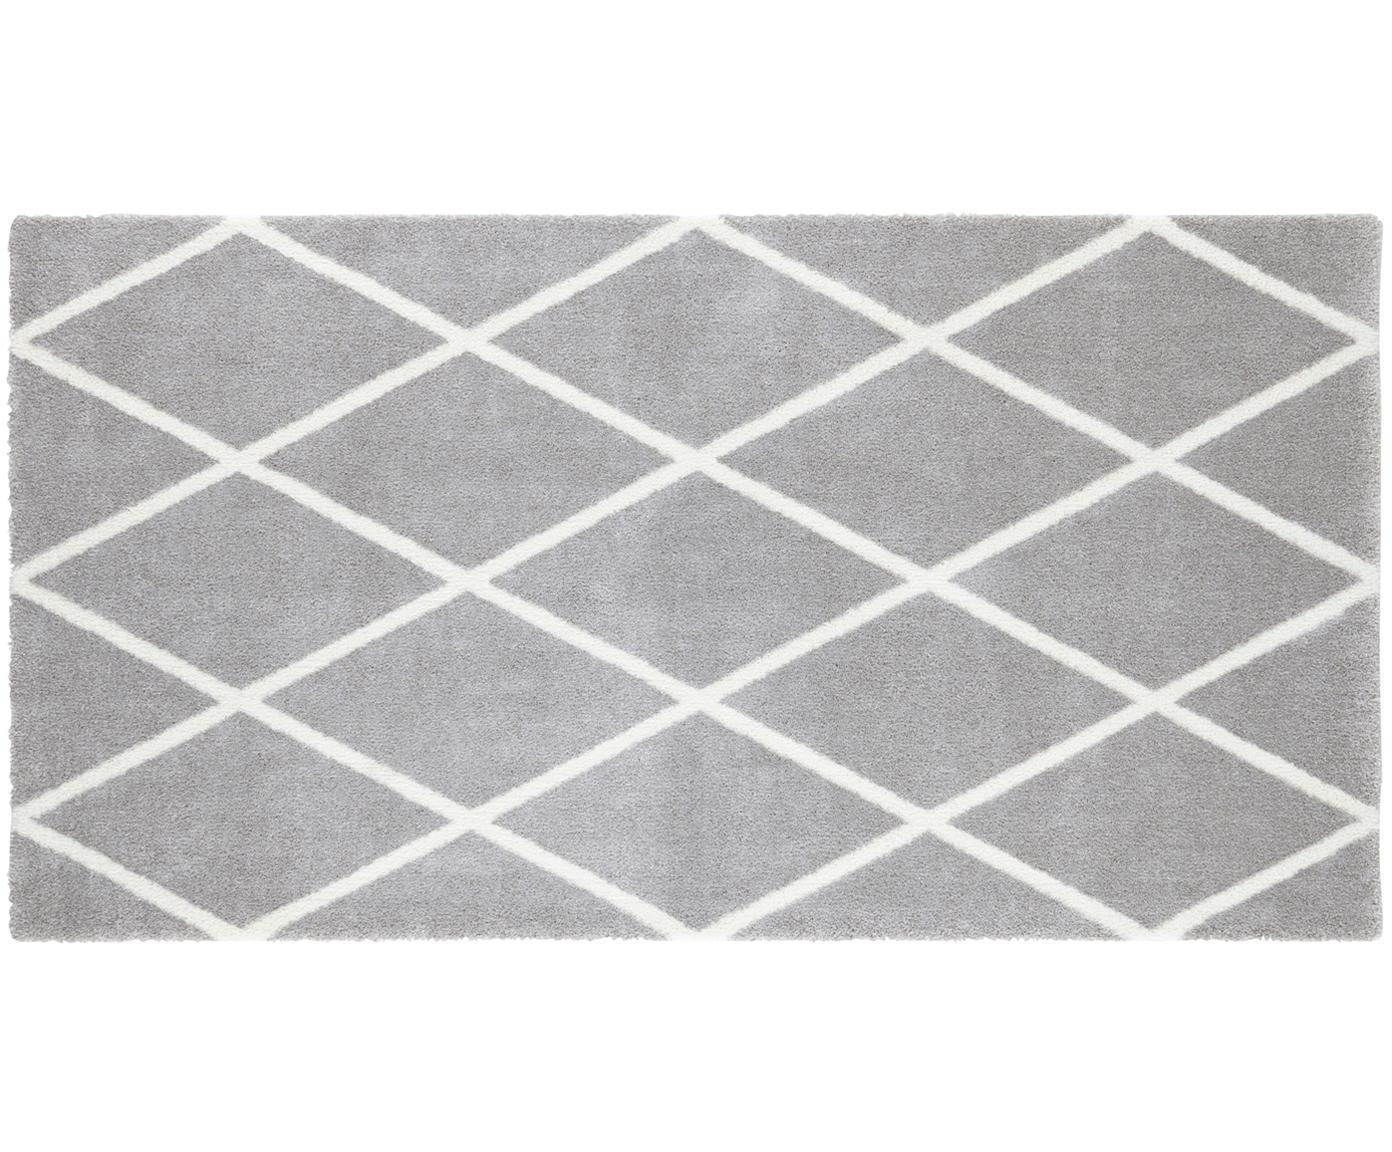 Teppich Lunel mit Rautenmuster, Flor: 85%Polypropylen, 15%Pol, Silbergrau, Creme, B 80 x L 150 cm (Größe XS)